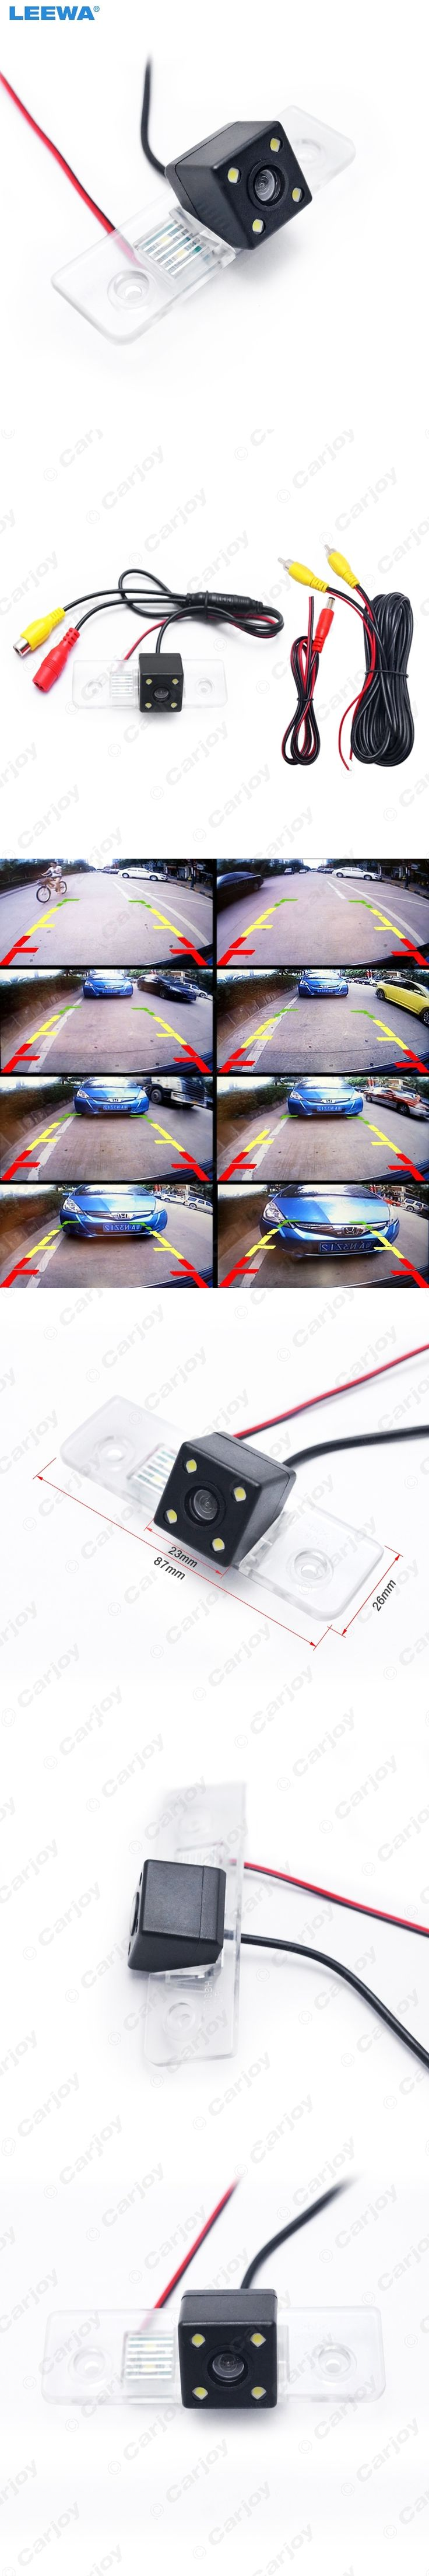 CCD Rear View Car Reverse Backup Camera With LED light For Skoda Octavia Mk2(1Z)(2004-2012) #CA4061